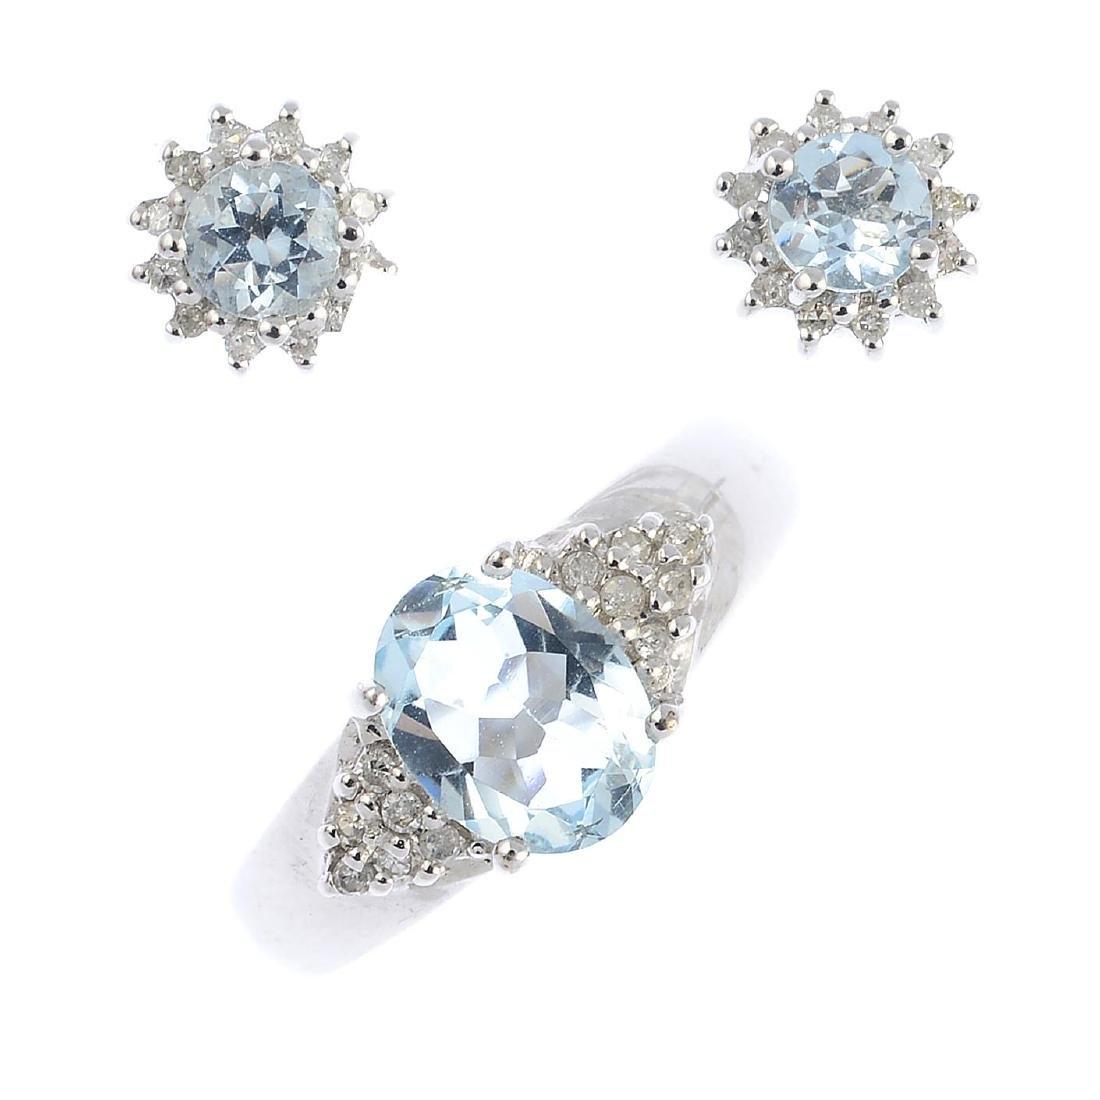 A selection of aquamarine and diamond jewellery. To